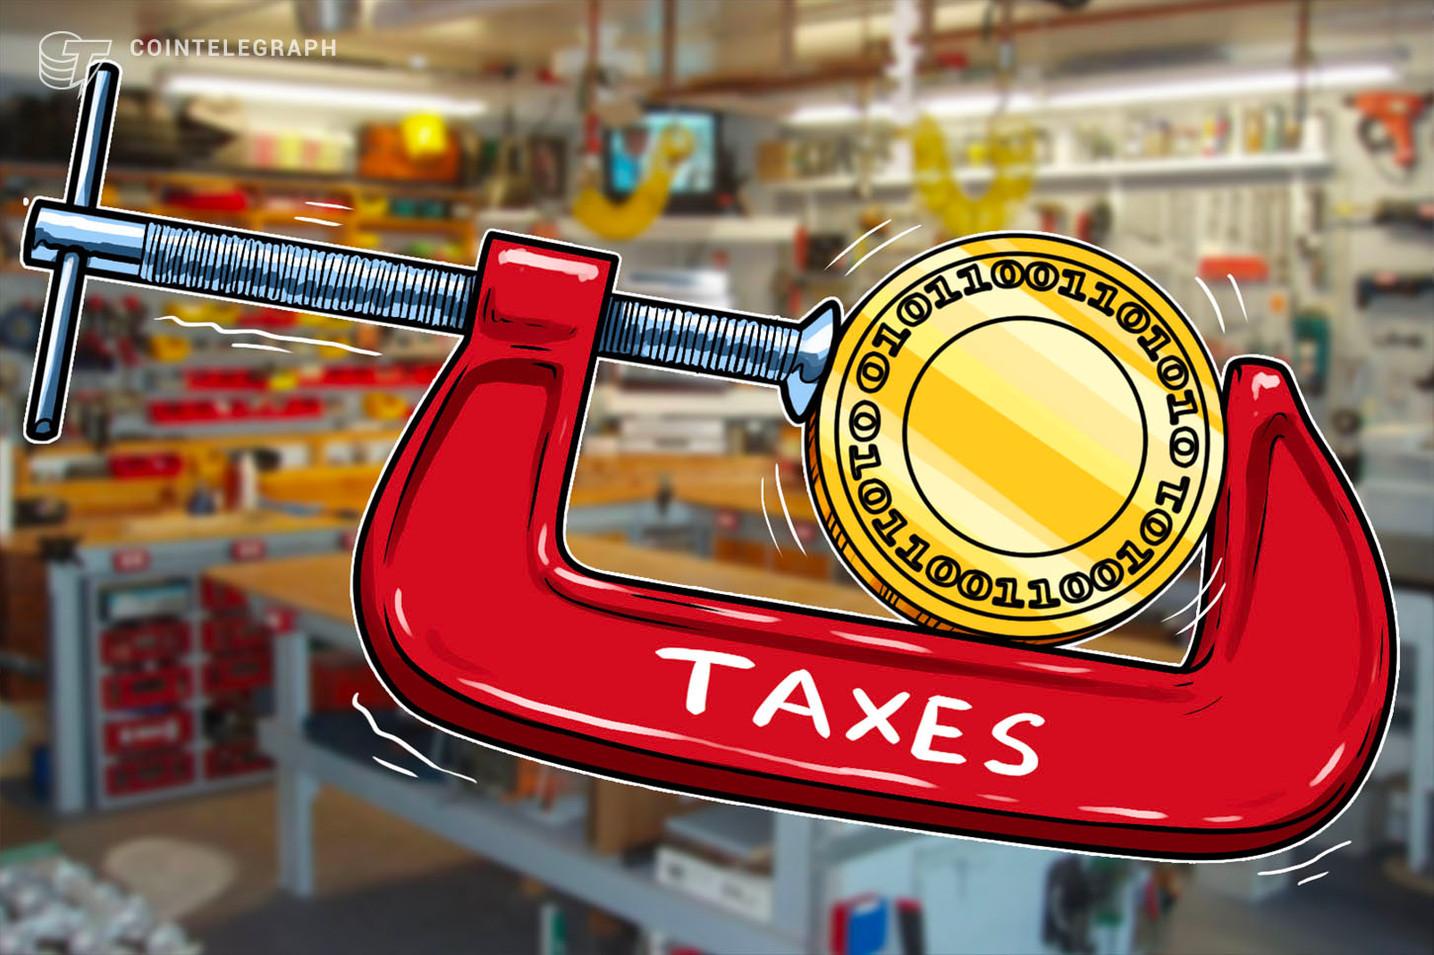 Aerial Partnersの仮想通貨税計算ツールGtax、Gincoのウォレット対応へ